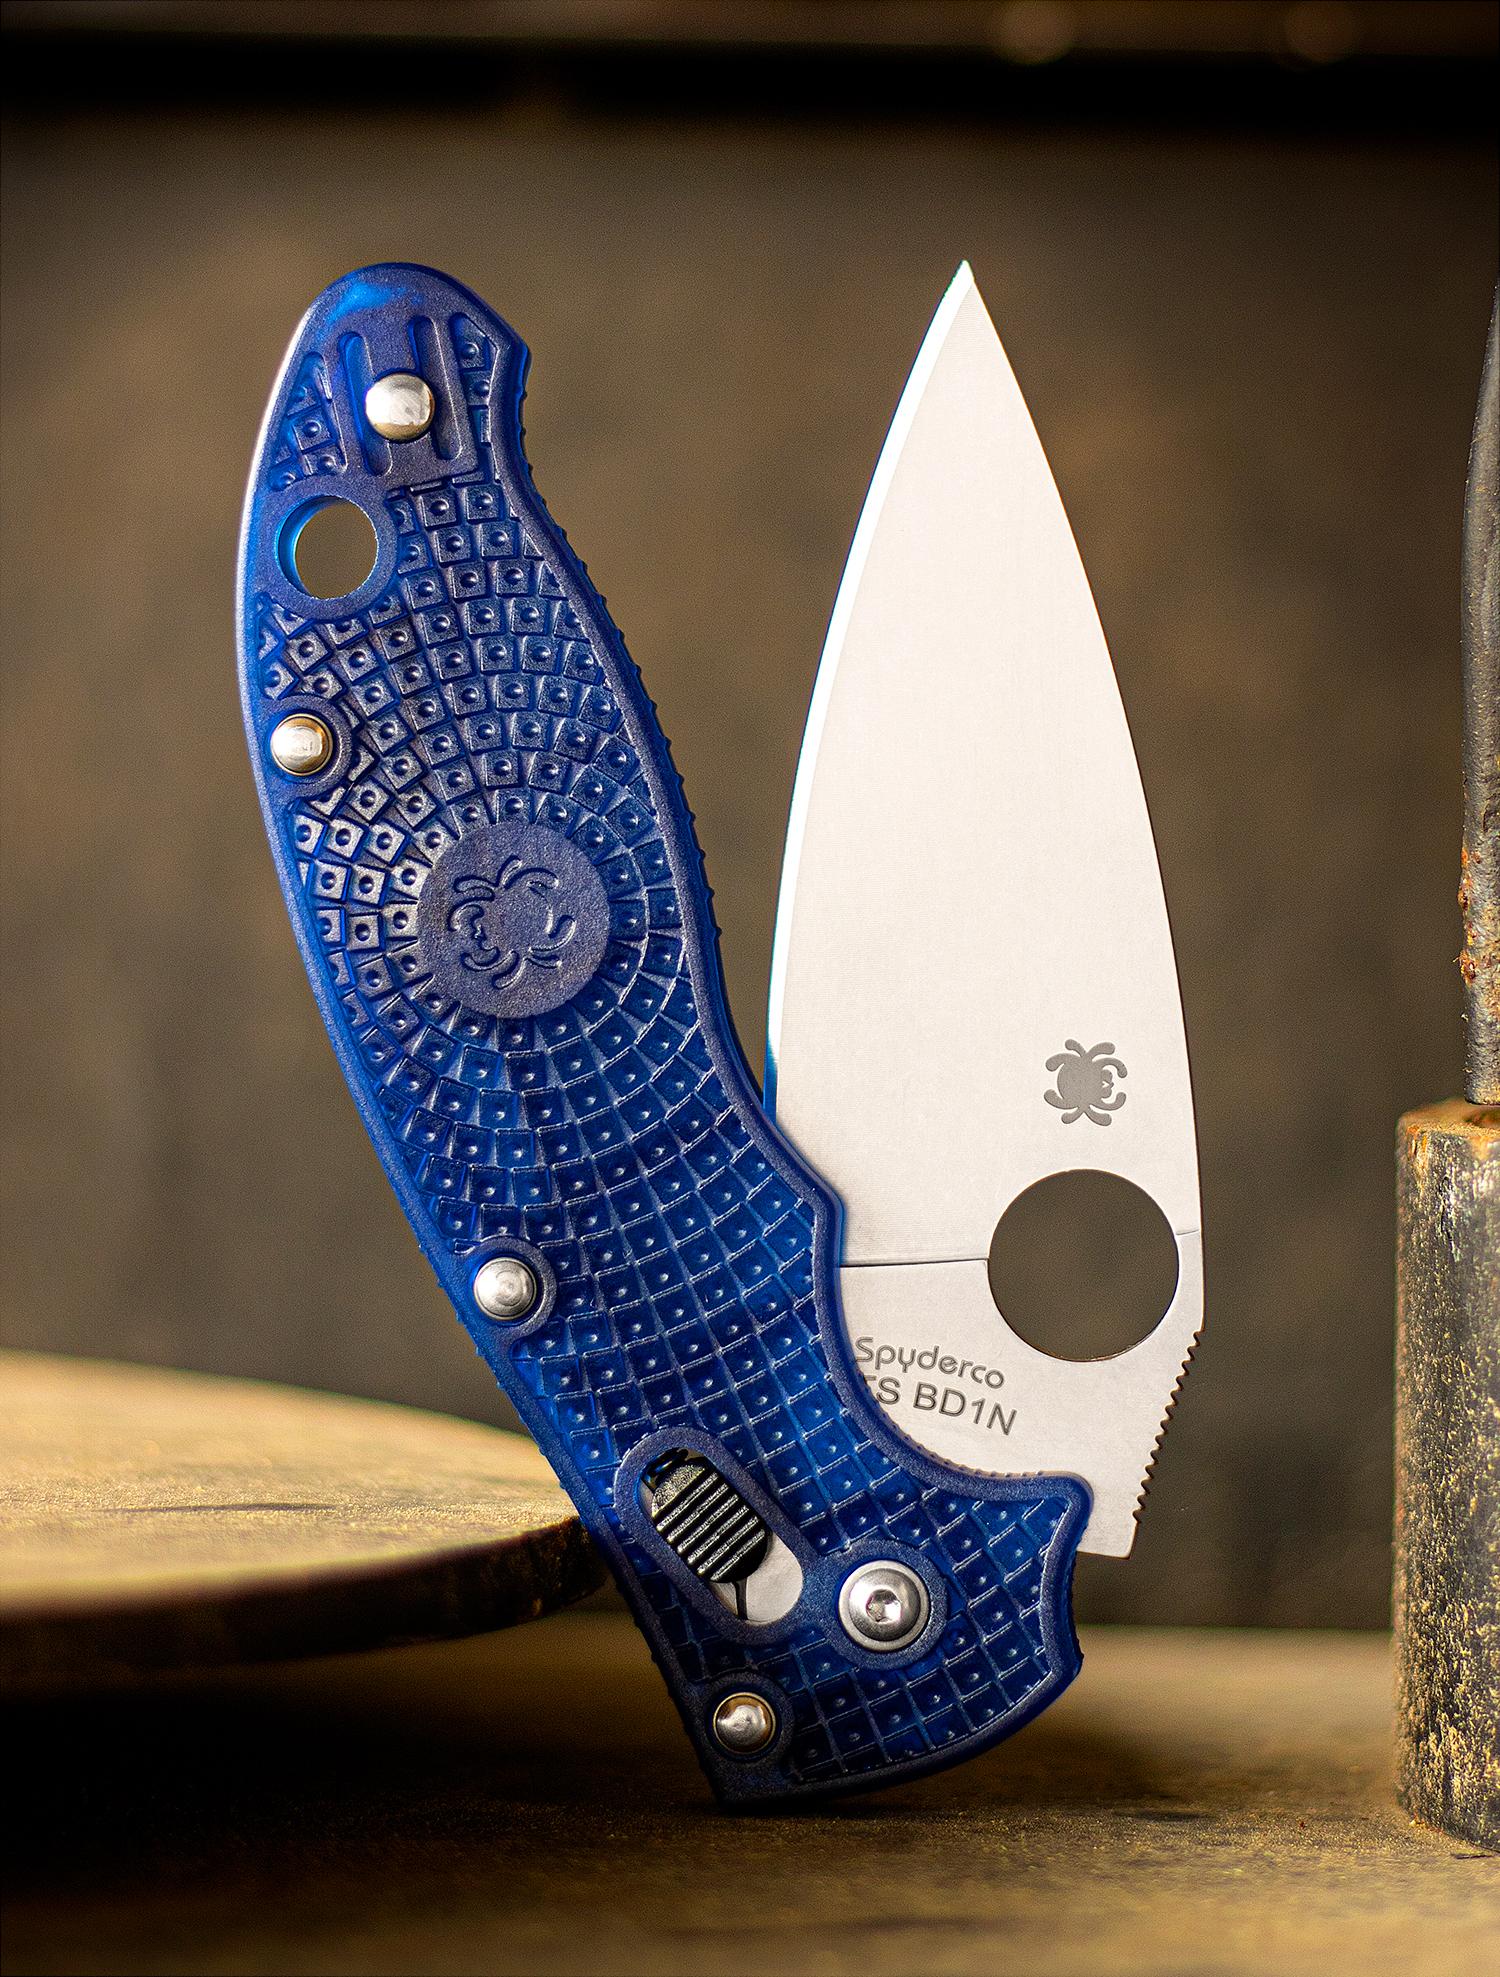 Фото 9 - Нож складной Manix 2 Lightweight Blue Spyderco 101PBL2, сталь Carpenter CTS™ - BD1 Alloy Satin Plain, рукоять пластик FRCP, синий